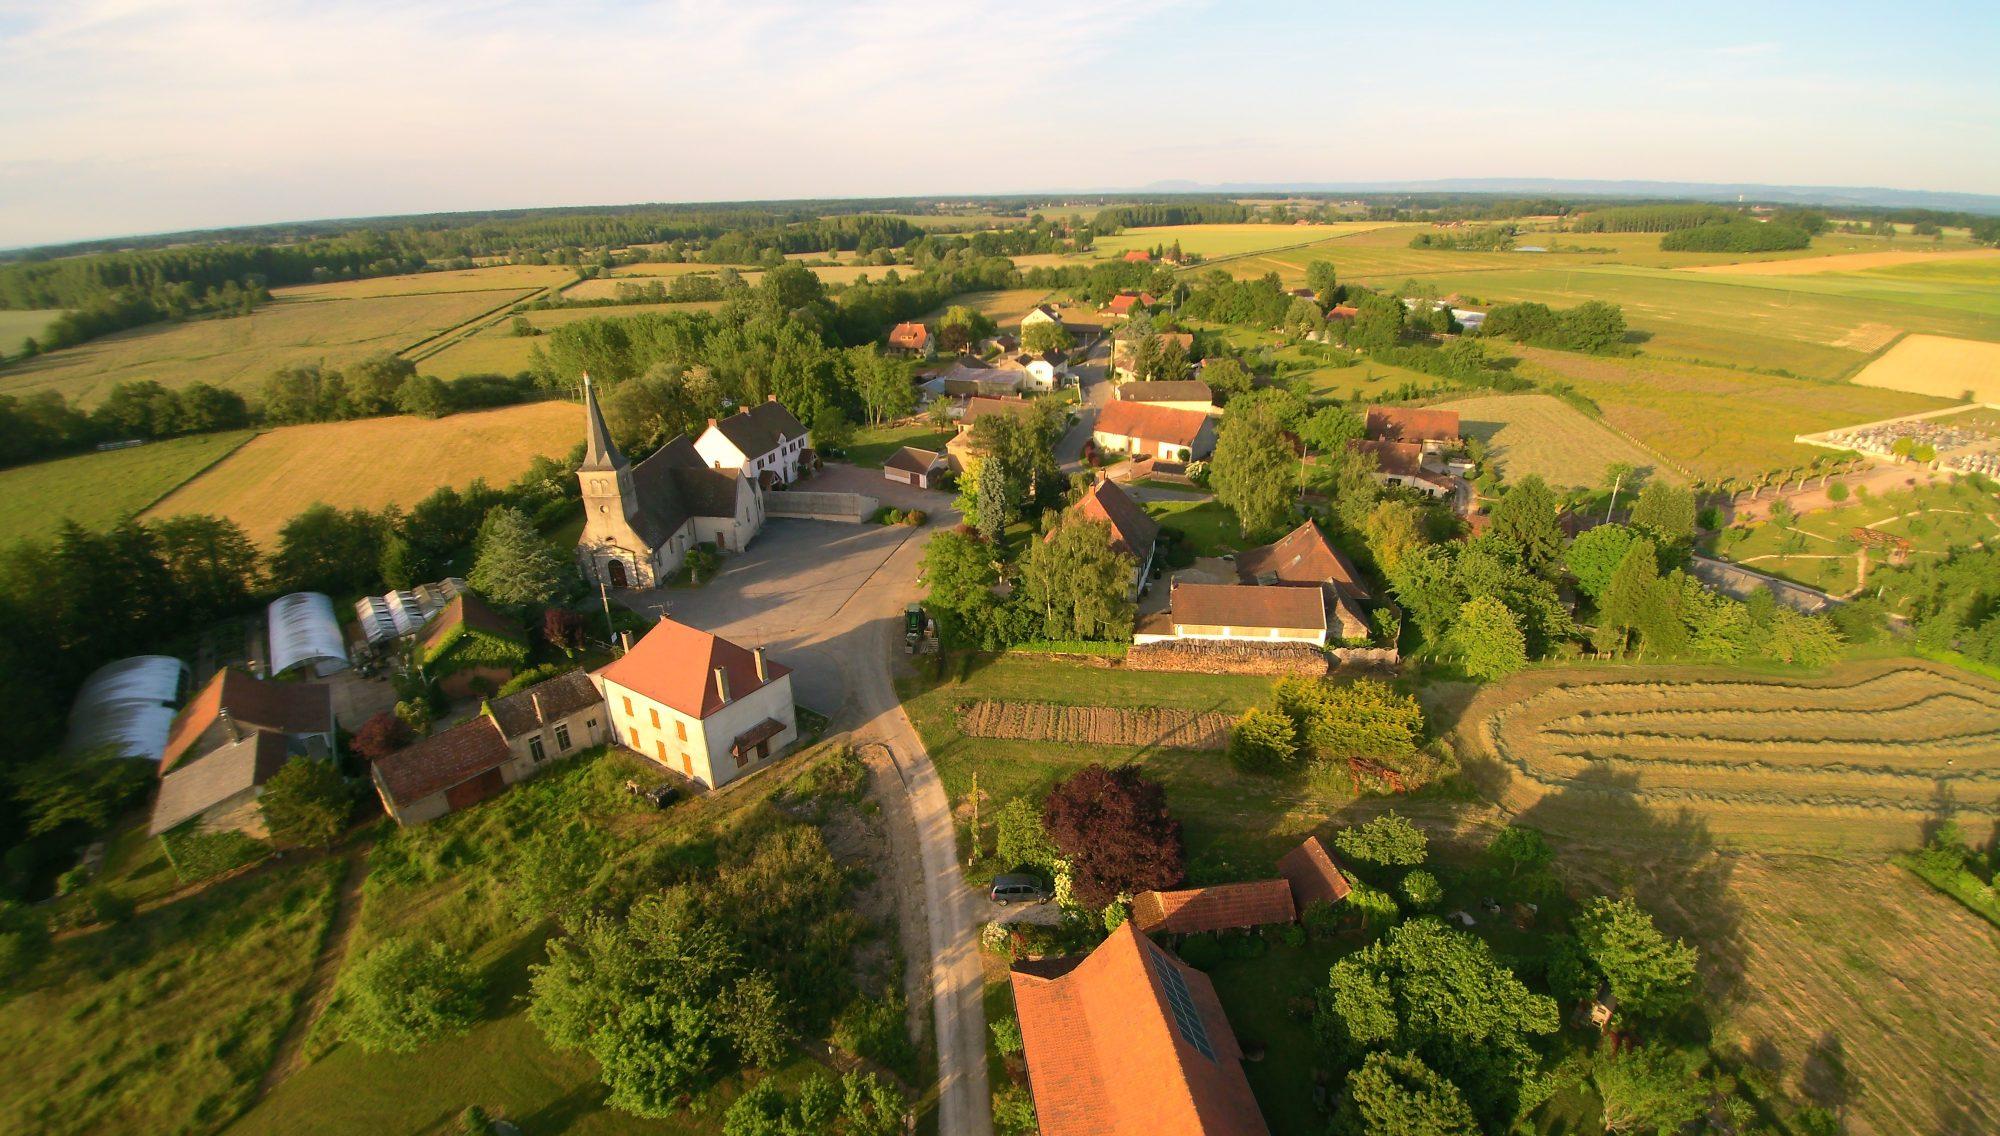 Mouthier-en-Bresse